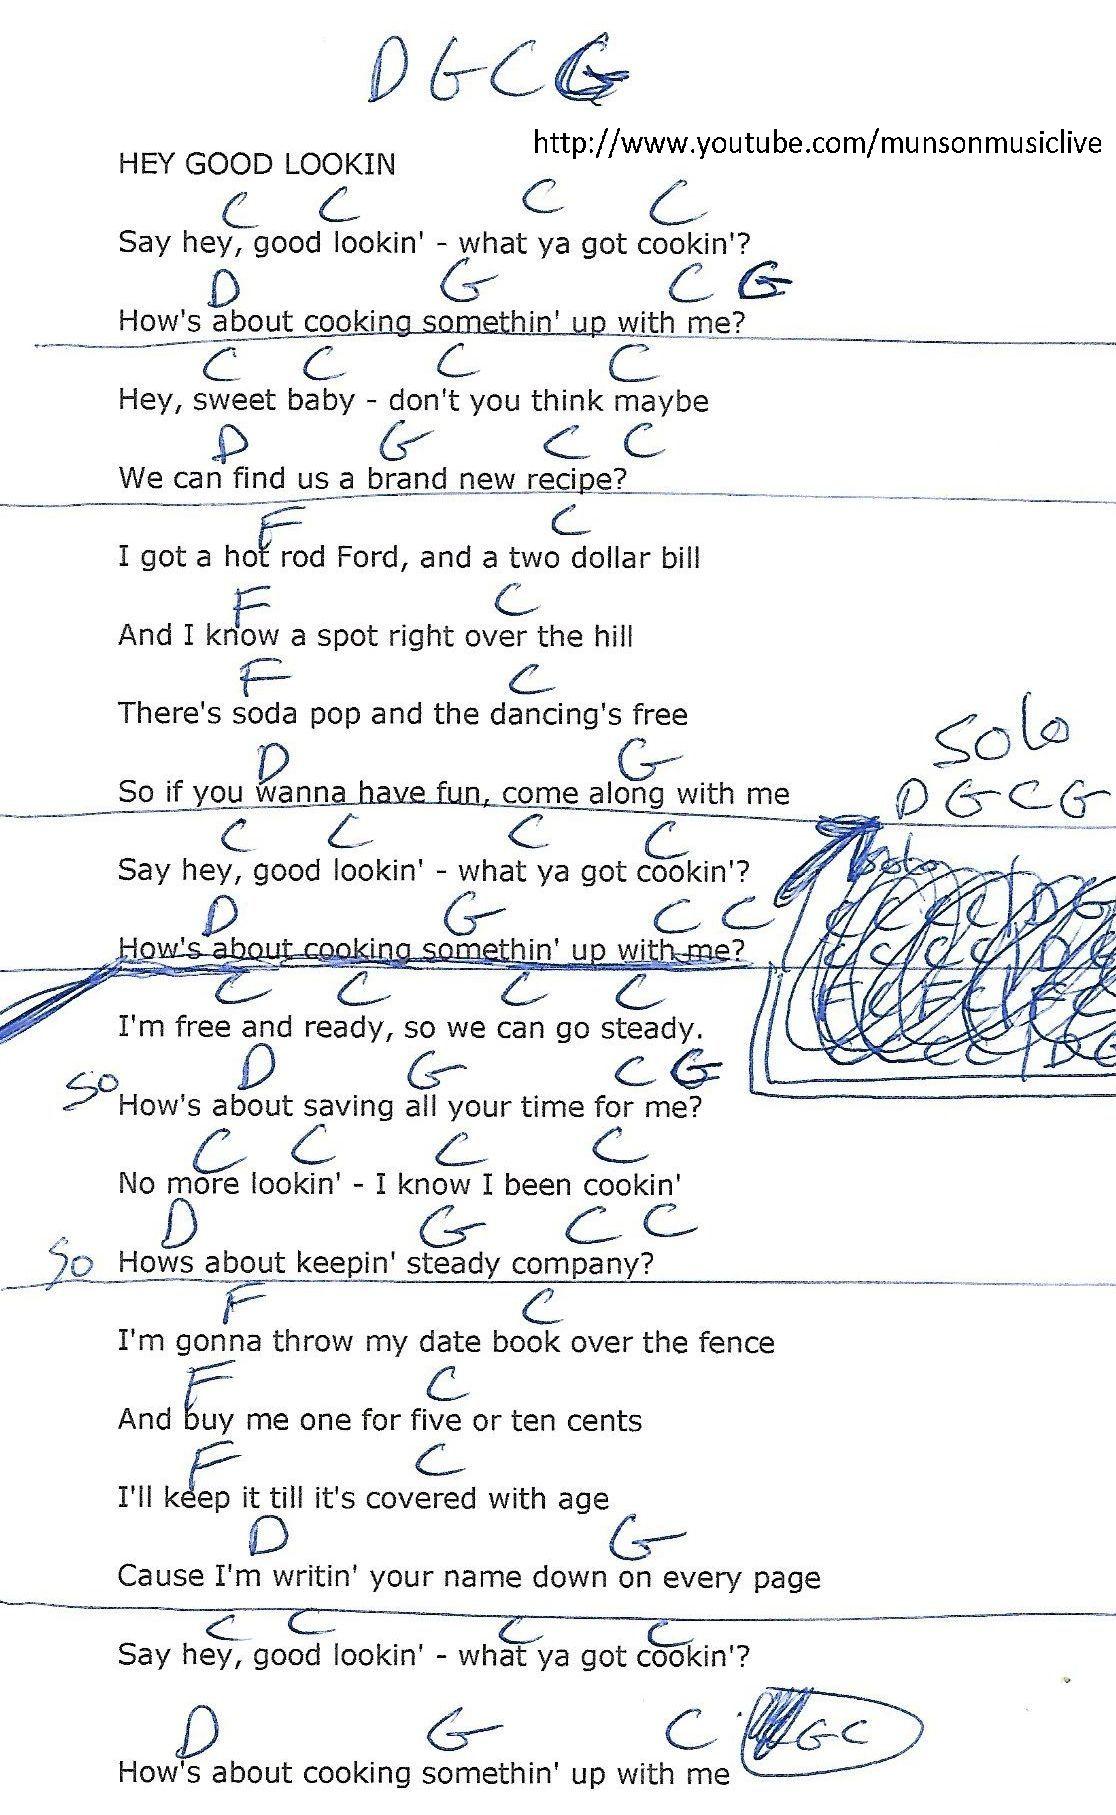 Hey Good Lookin Hank Williams Guitar Chord Chart Guitar Lesson